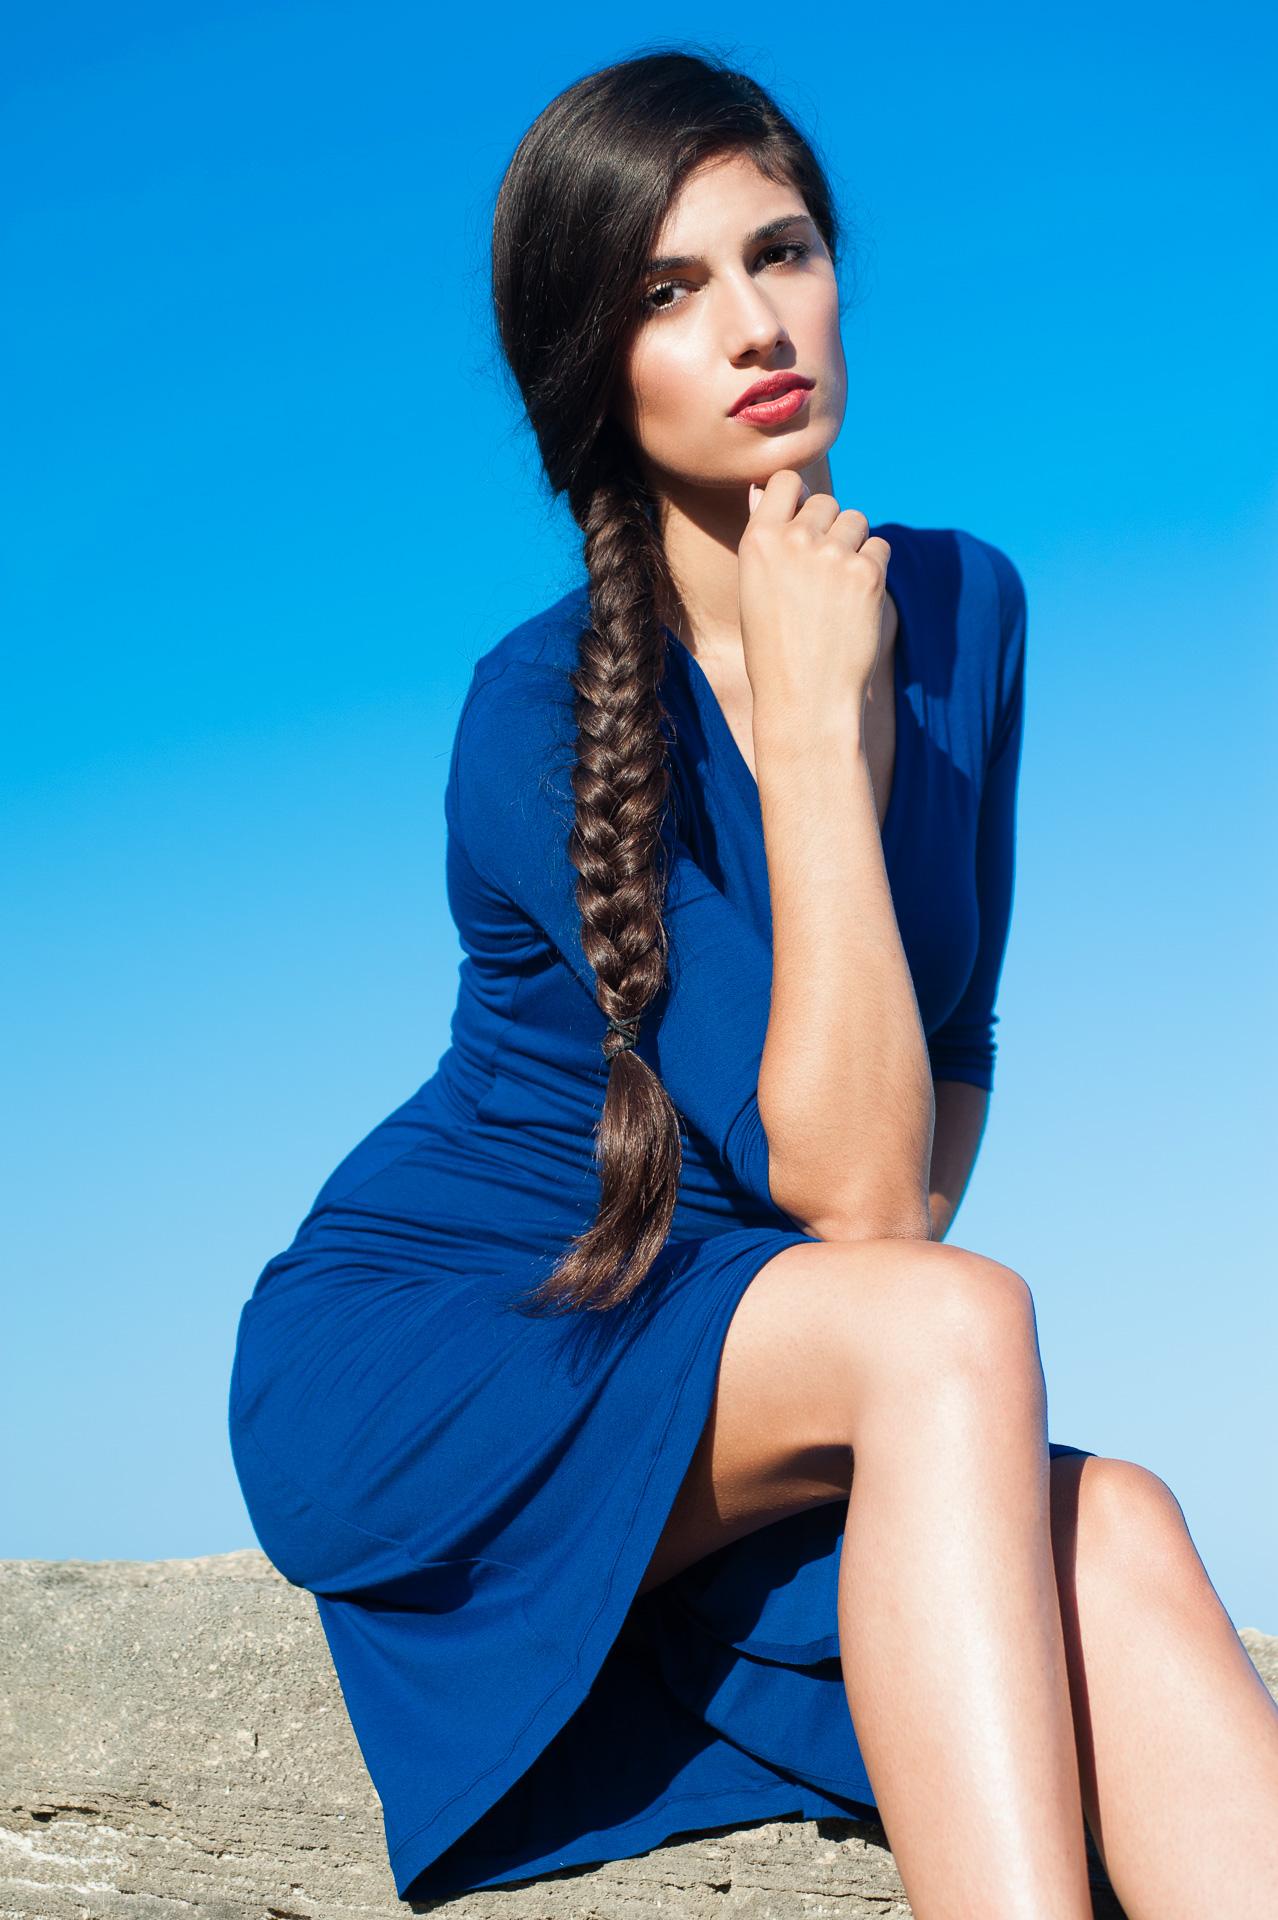 Mallorca - Fashionshooting mit Vicenca Petrovic